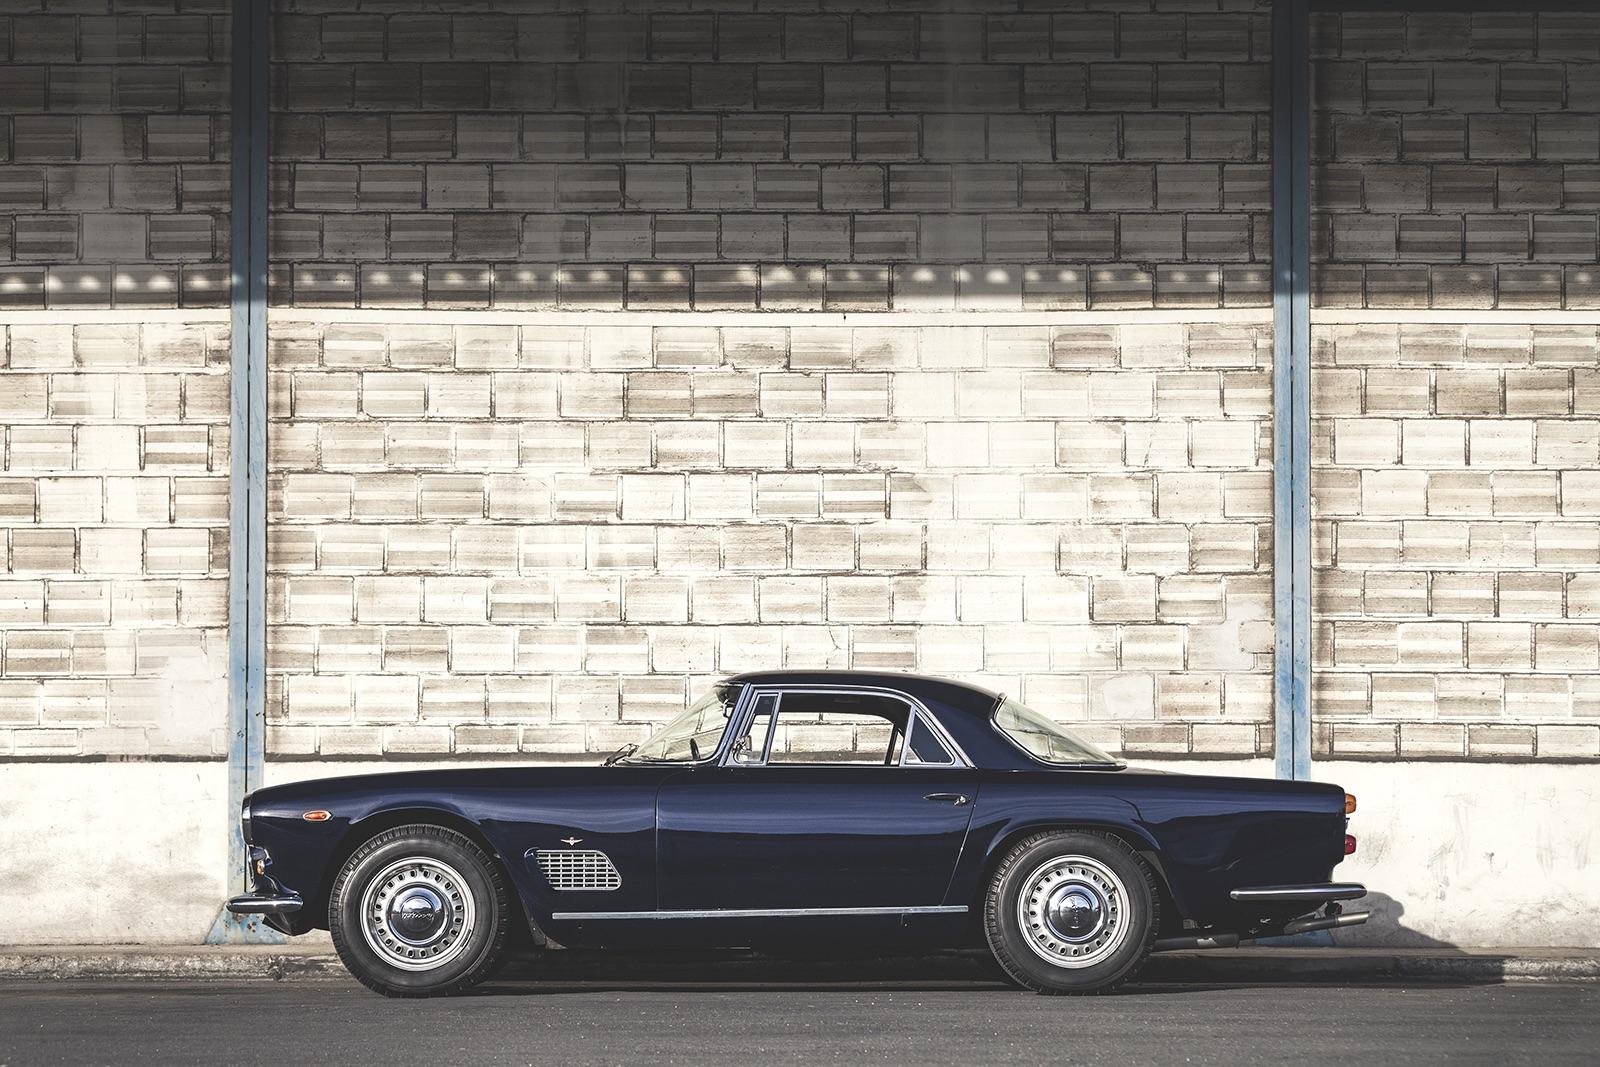 1964 maserati 3500 gt superleggera classic driver market. Black Bedroom Furniture Sets. Home Design Ideas